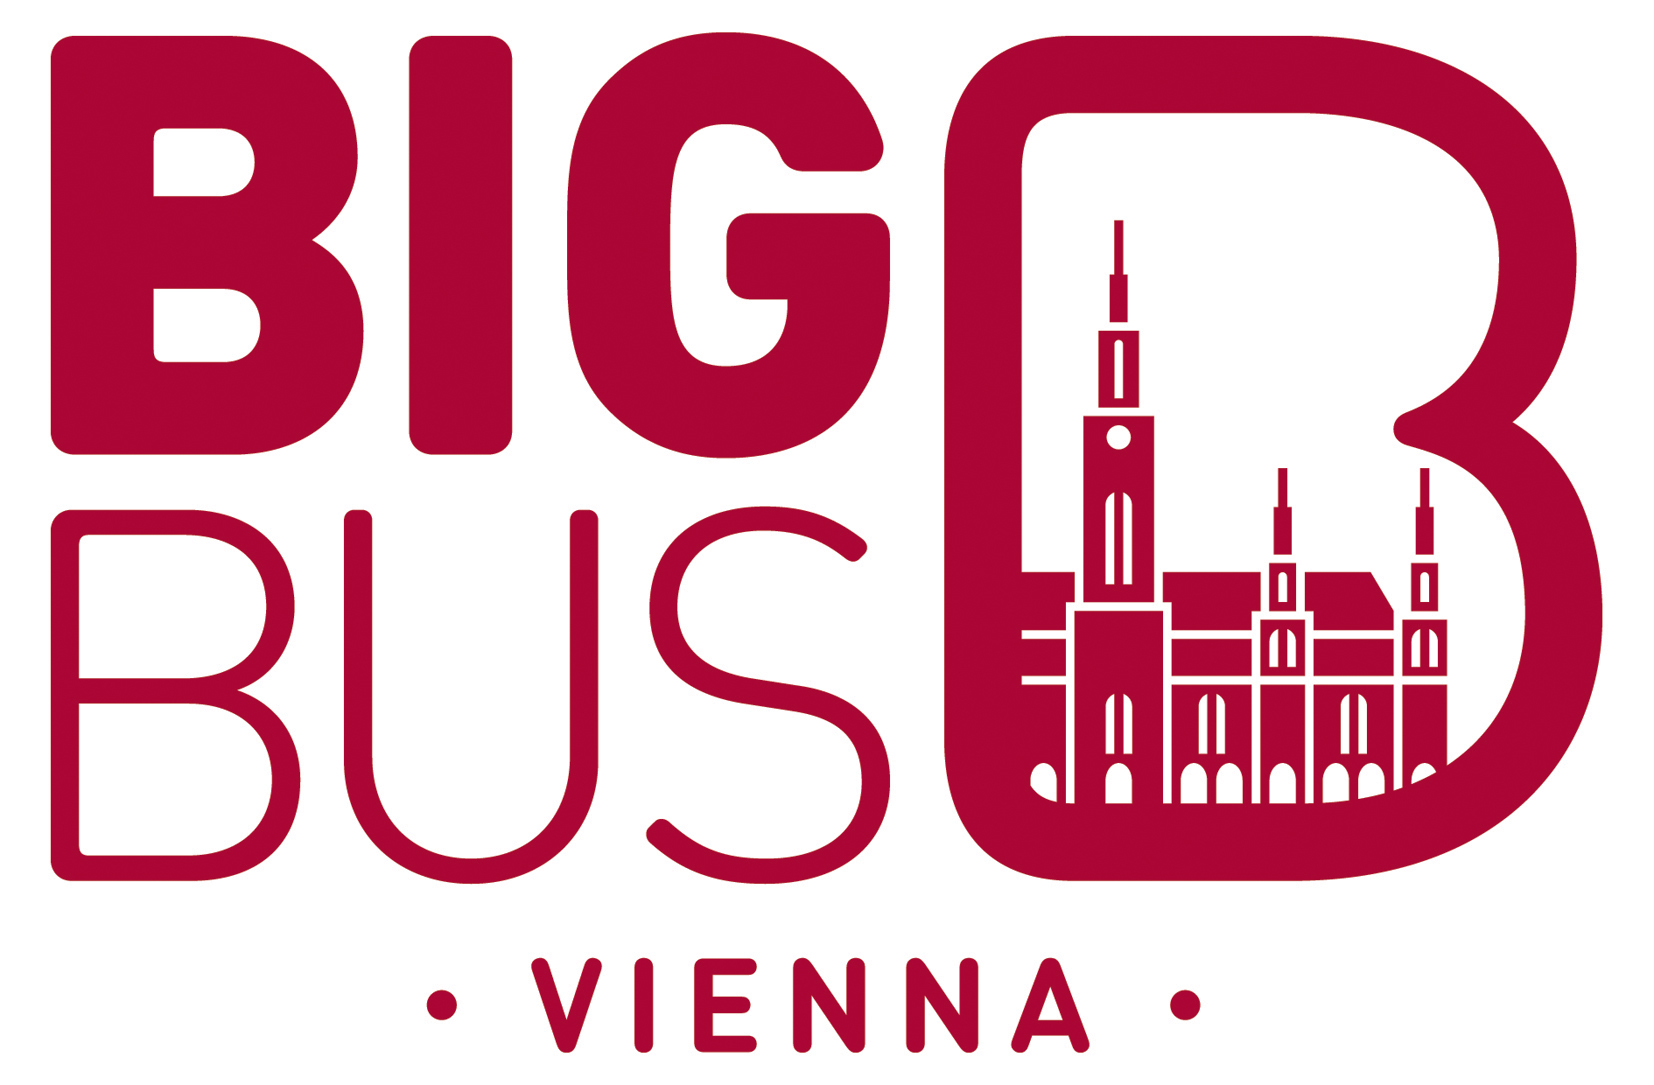 BB_Logo_City Name_VIENNA_BURGUNDY 194.jpg